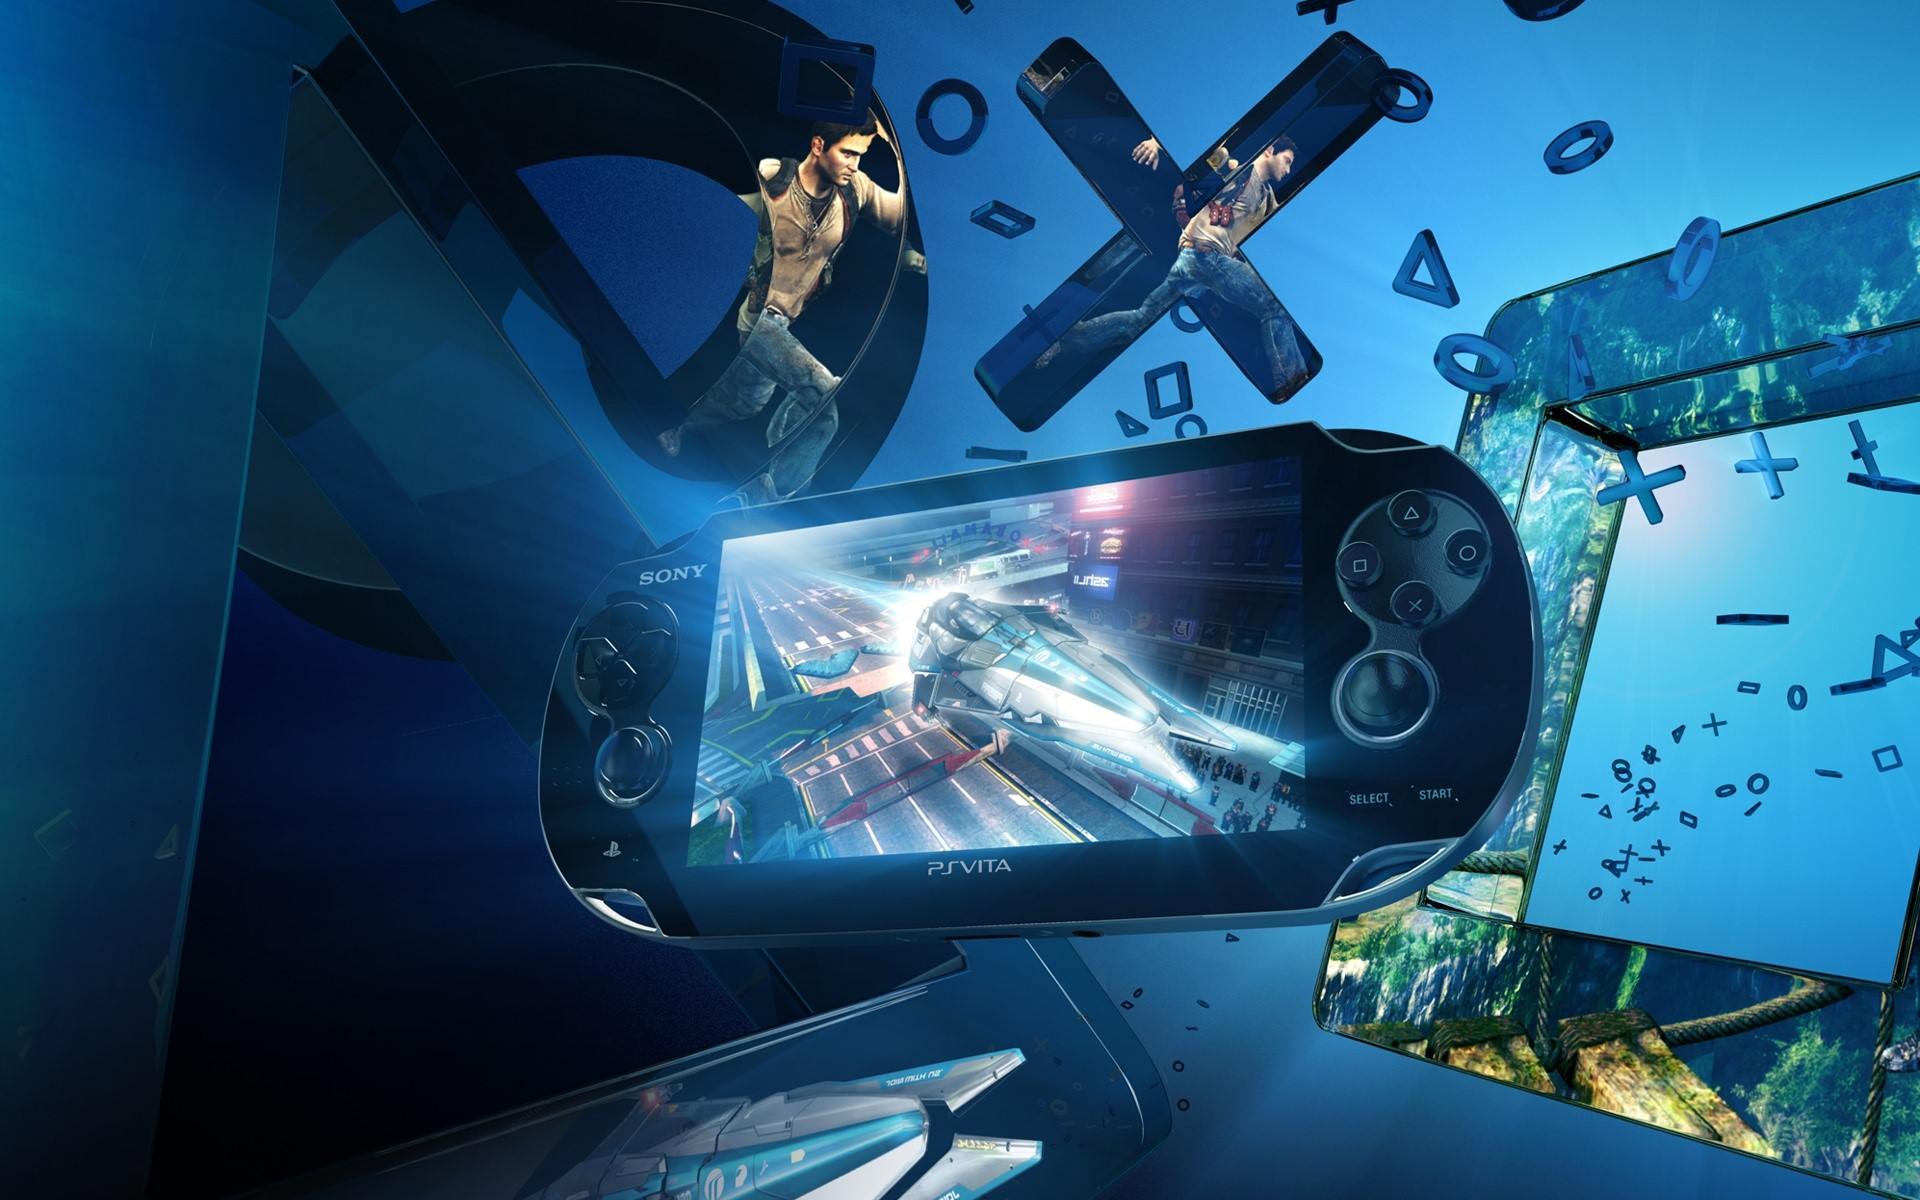 Fondos de pantalla Playstation Vita